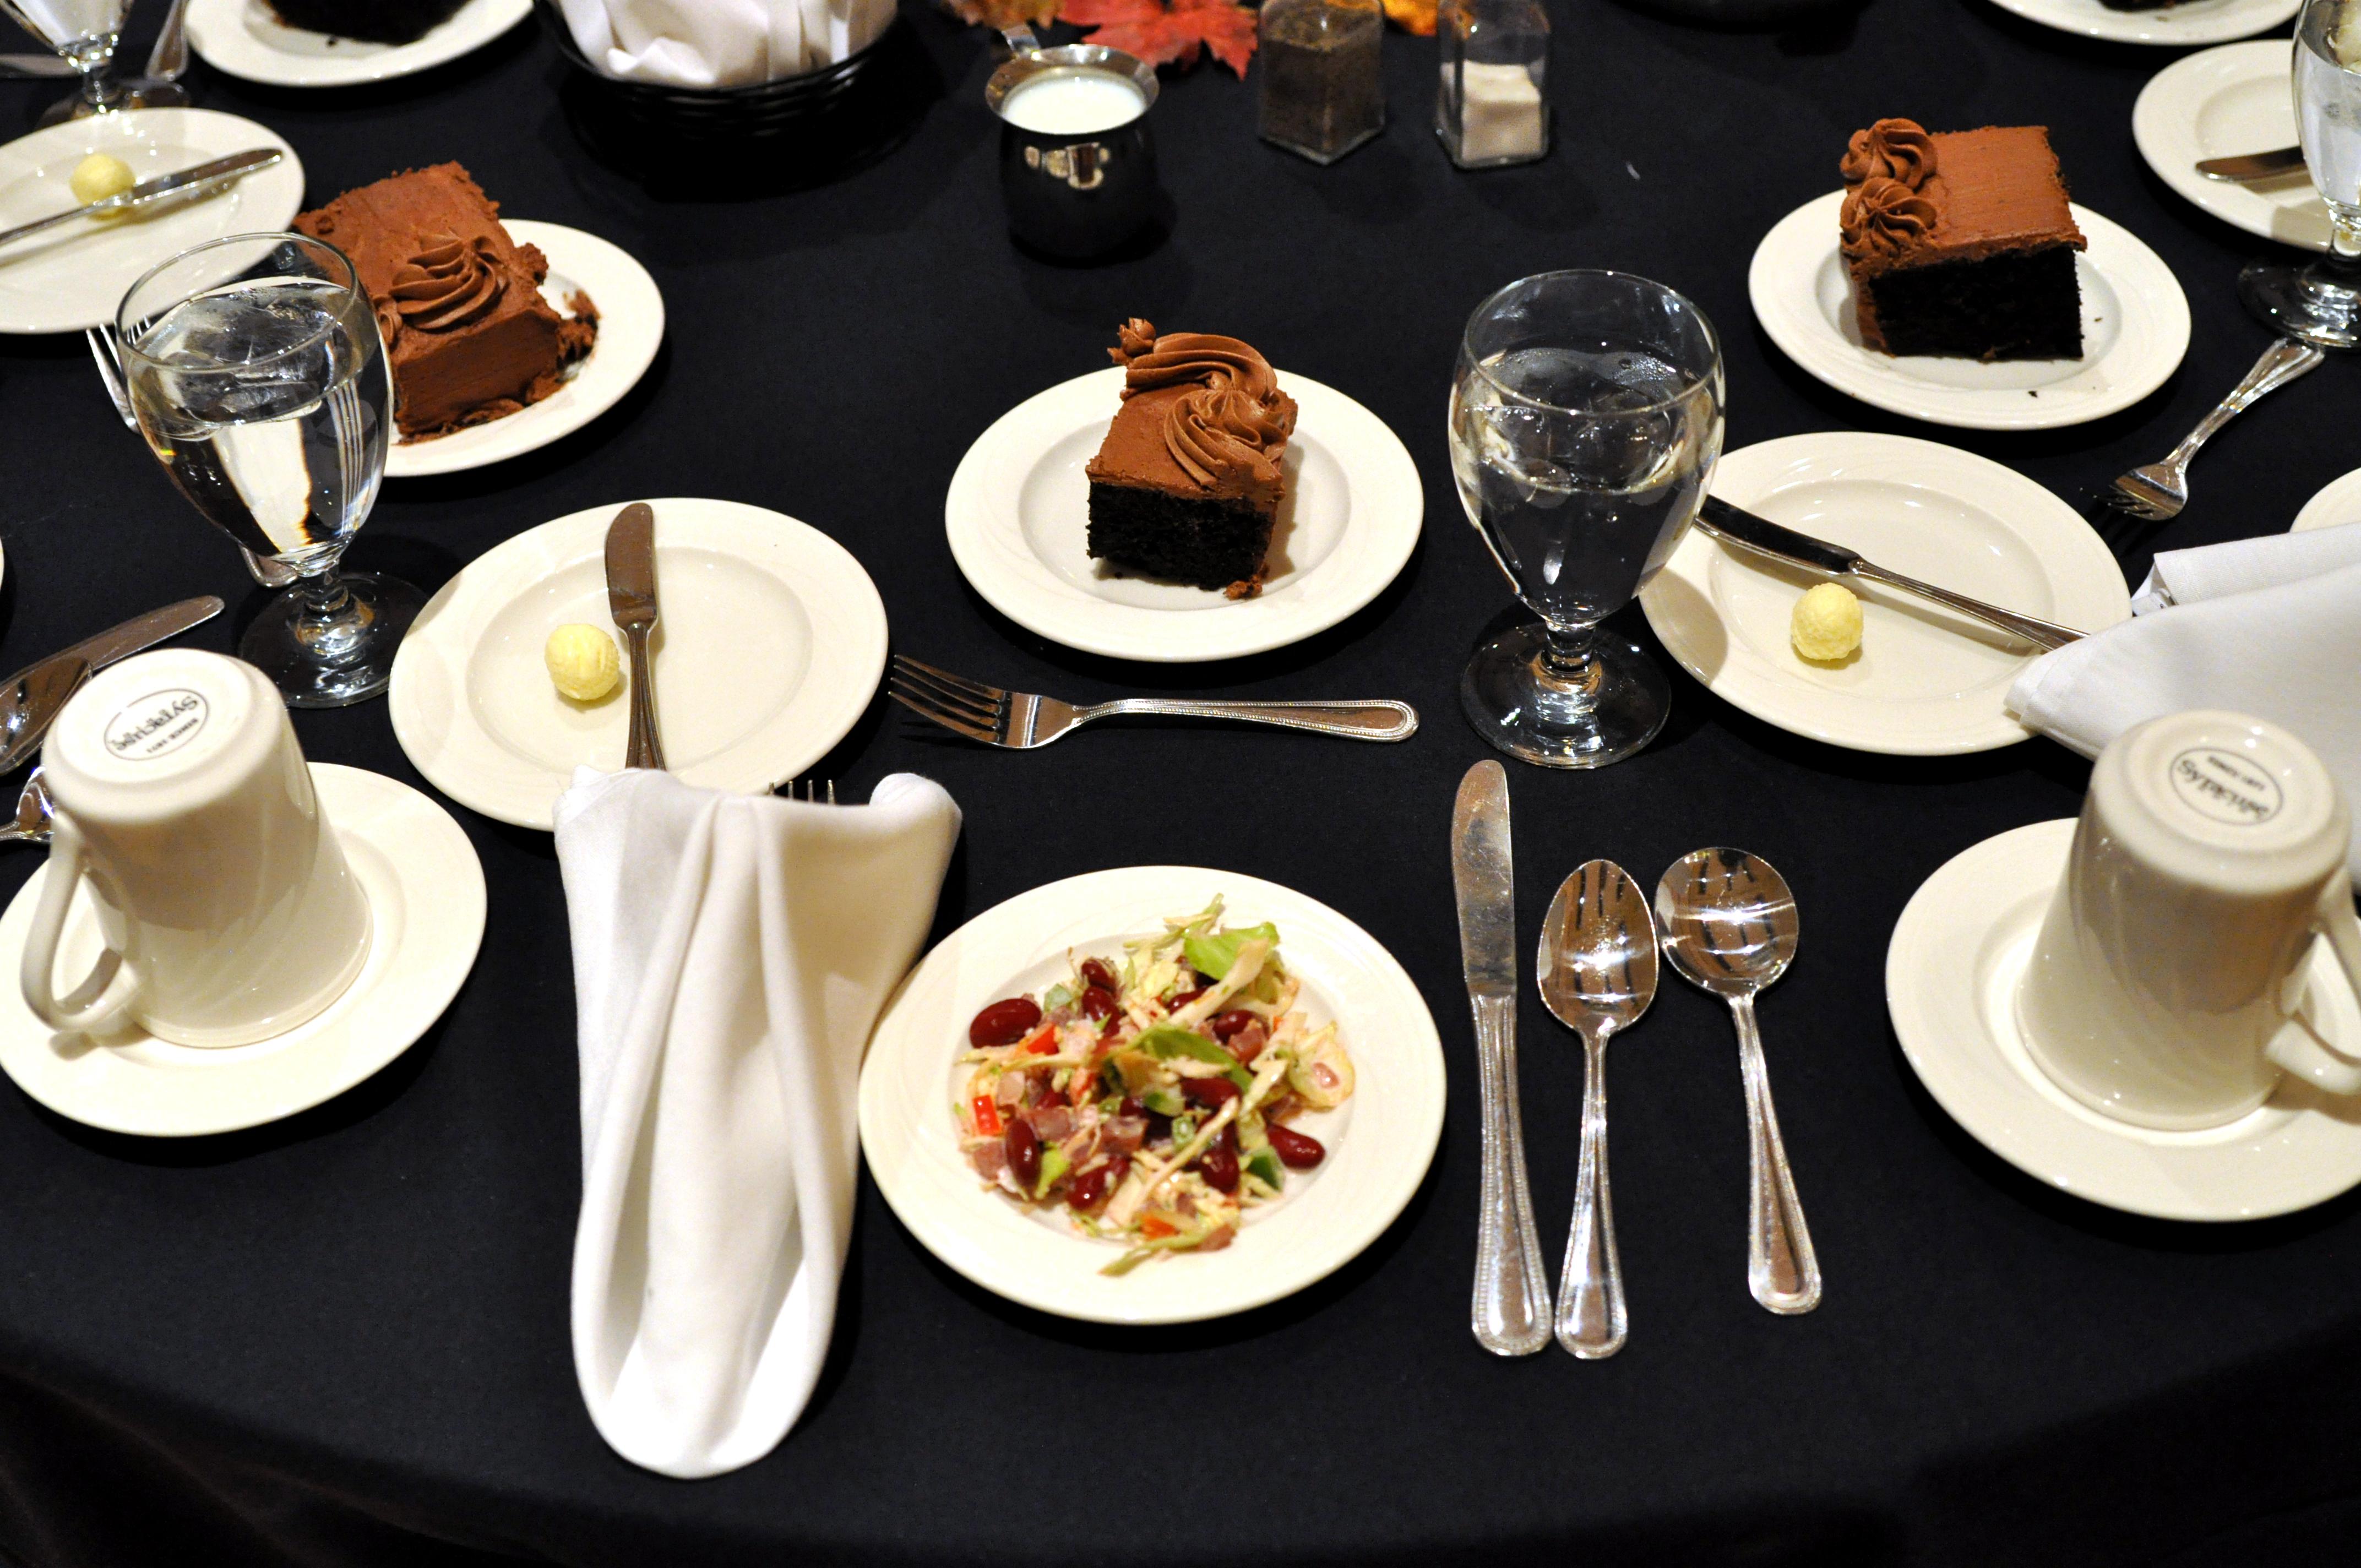 Etiquette Dinner Prepares Students for Professional World